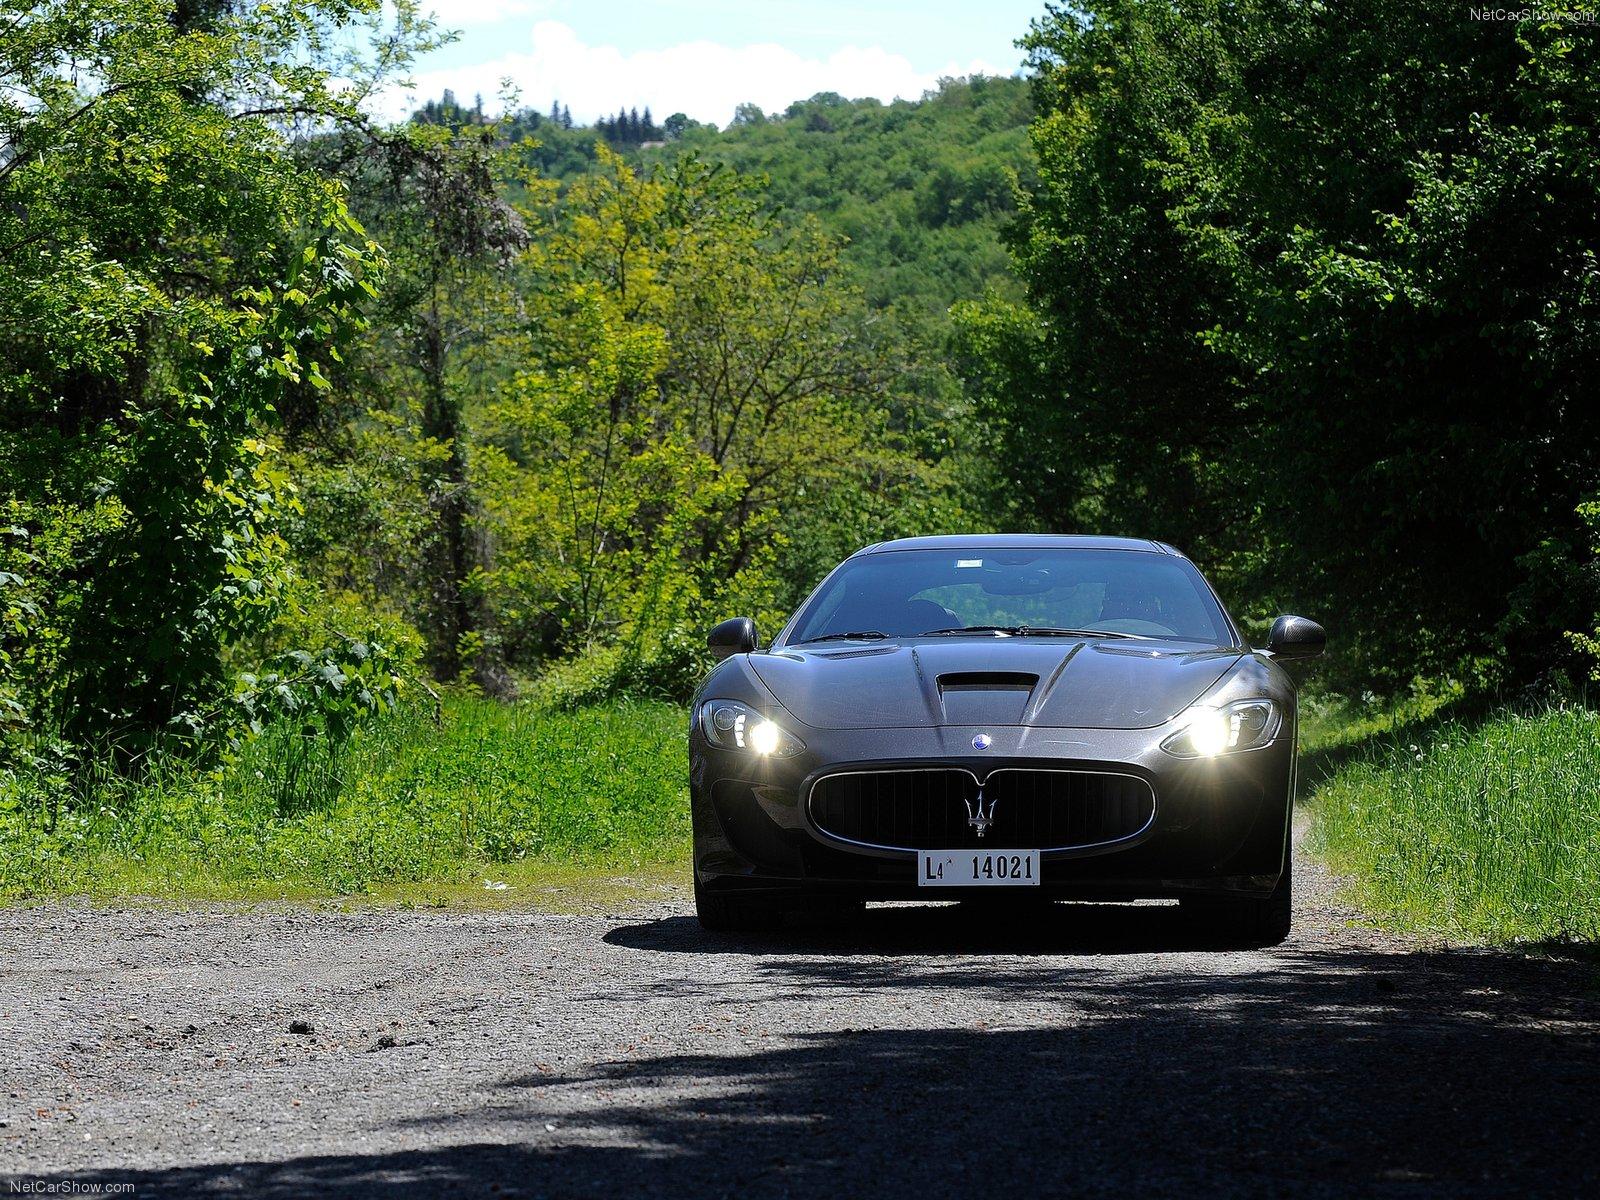 Hình ảnh siêu xe Maserati GranTurismo MC Stradale 2014 & nội ngoại thất